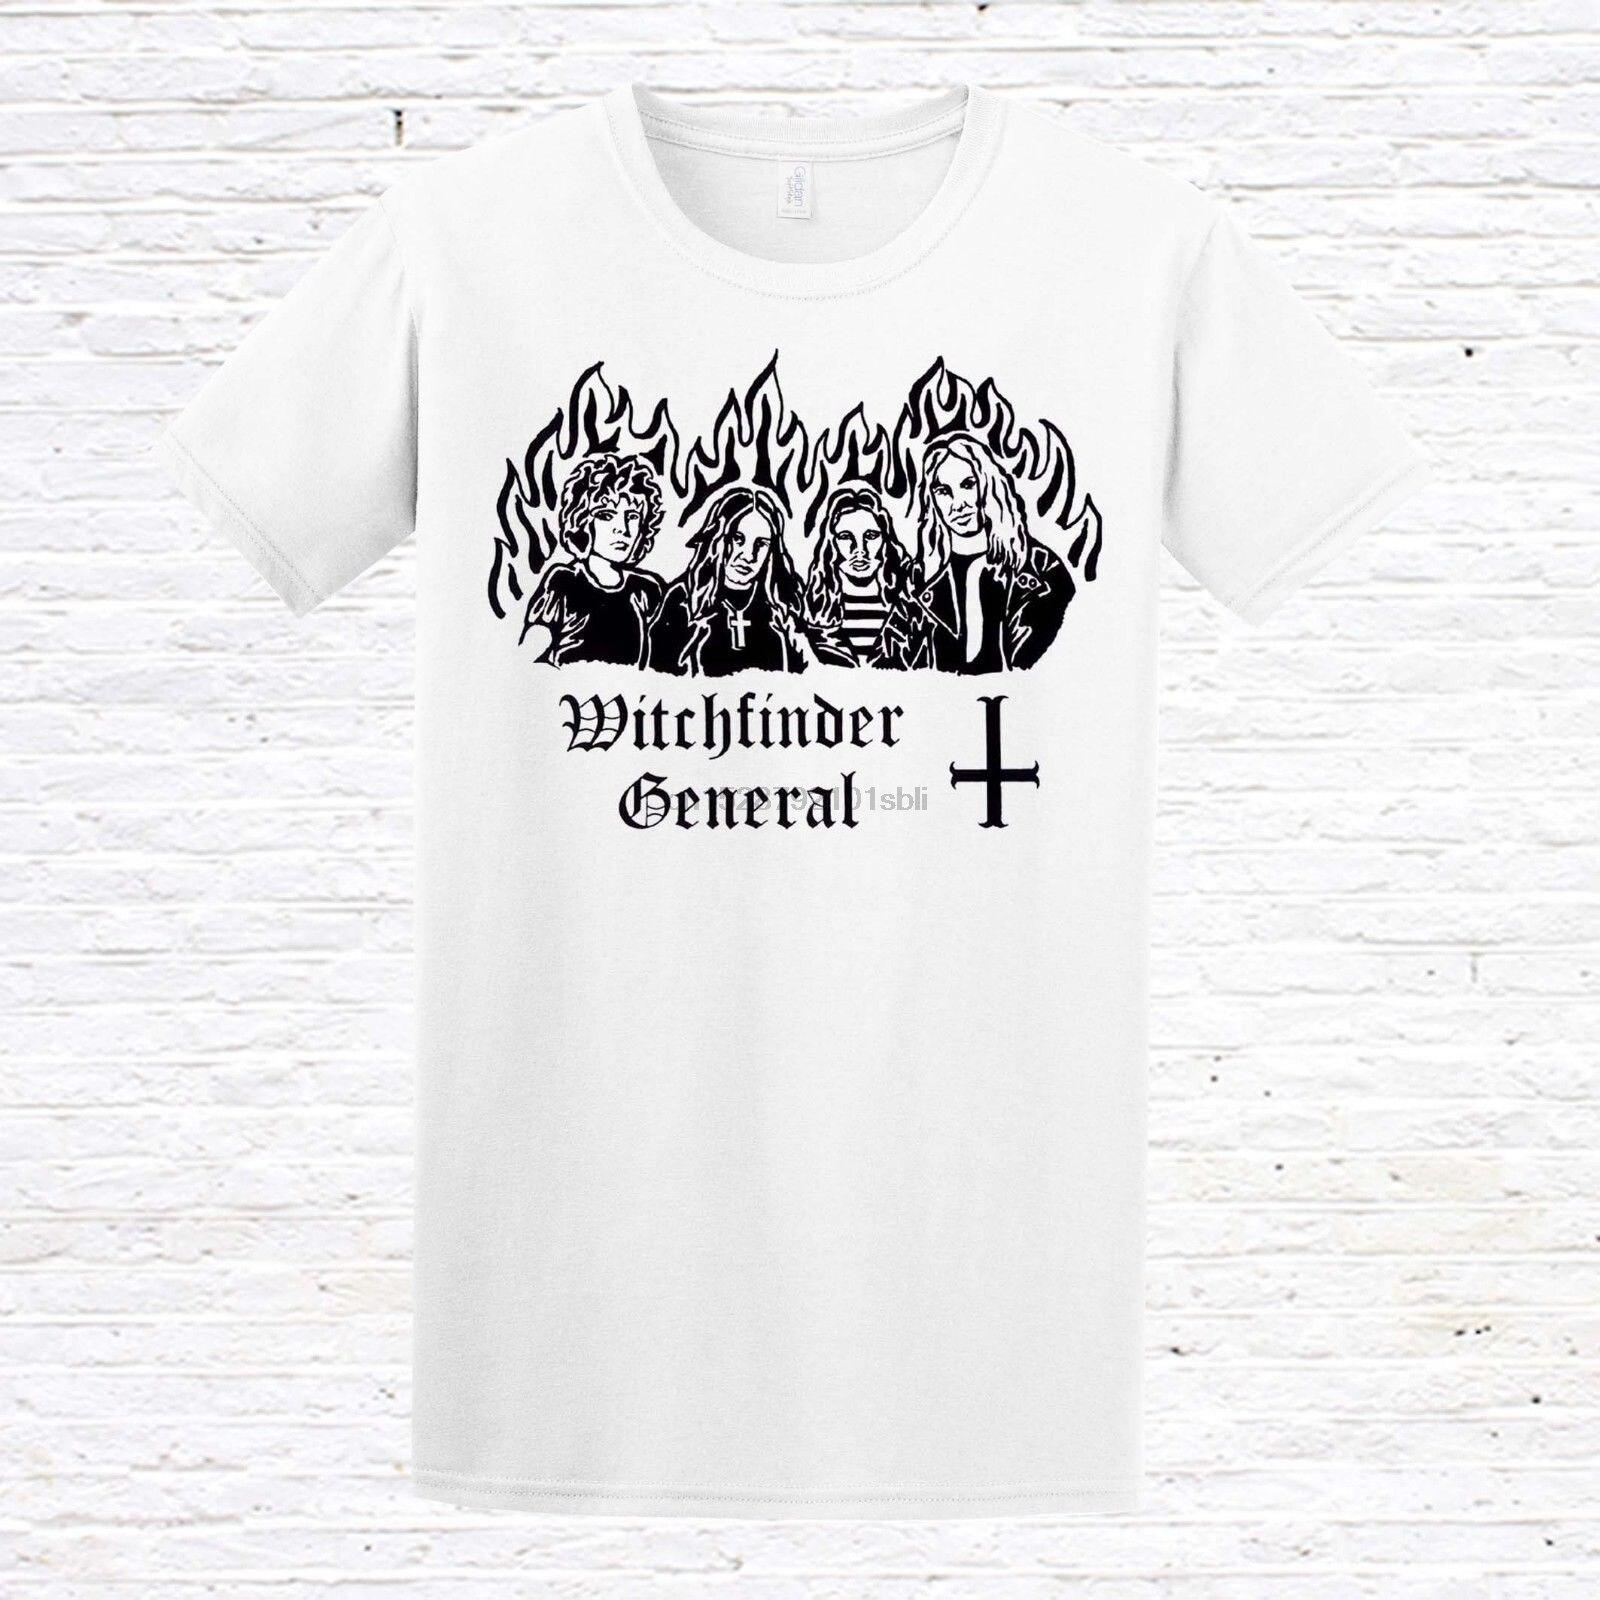 Witchfinder General camiseta (NWOBHM Doom Metal)